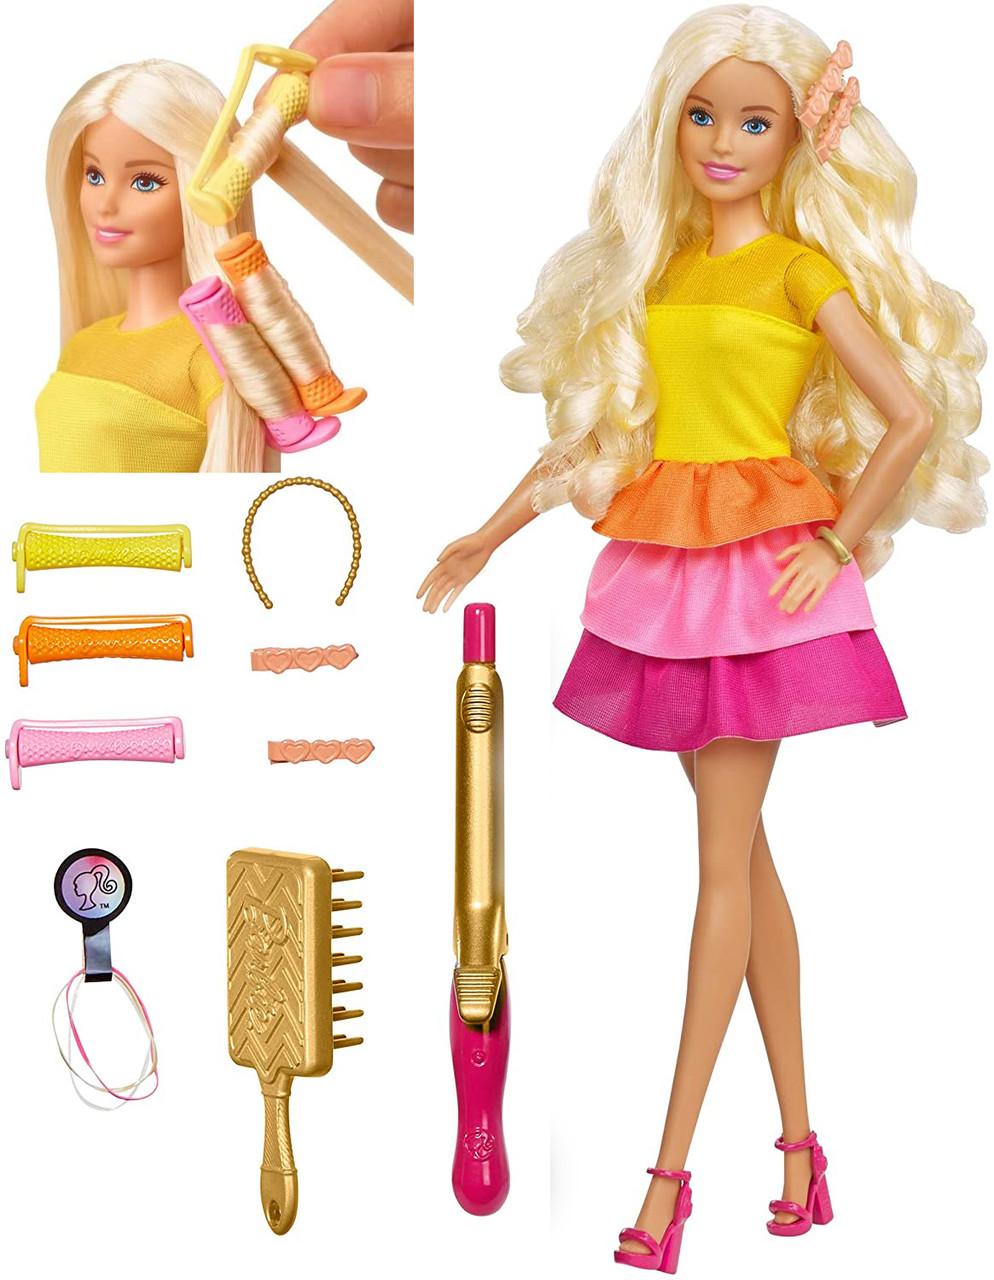 Кукла Барби - Роскошные локоны создай прическу Barbie Ultimate Curls Blonde Doll and Hairstyling